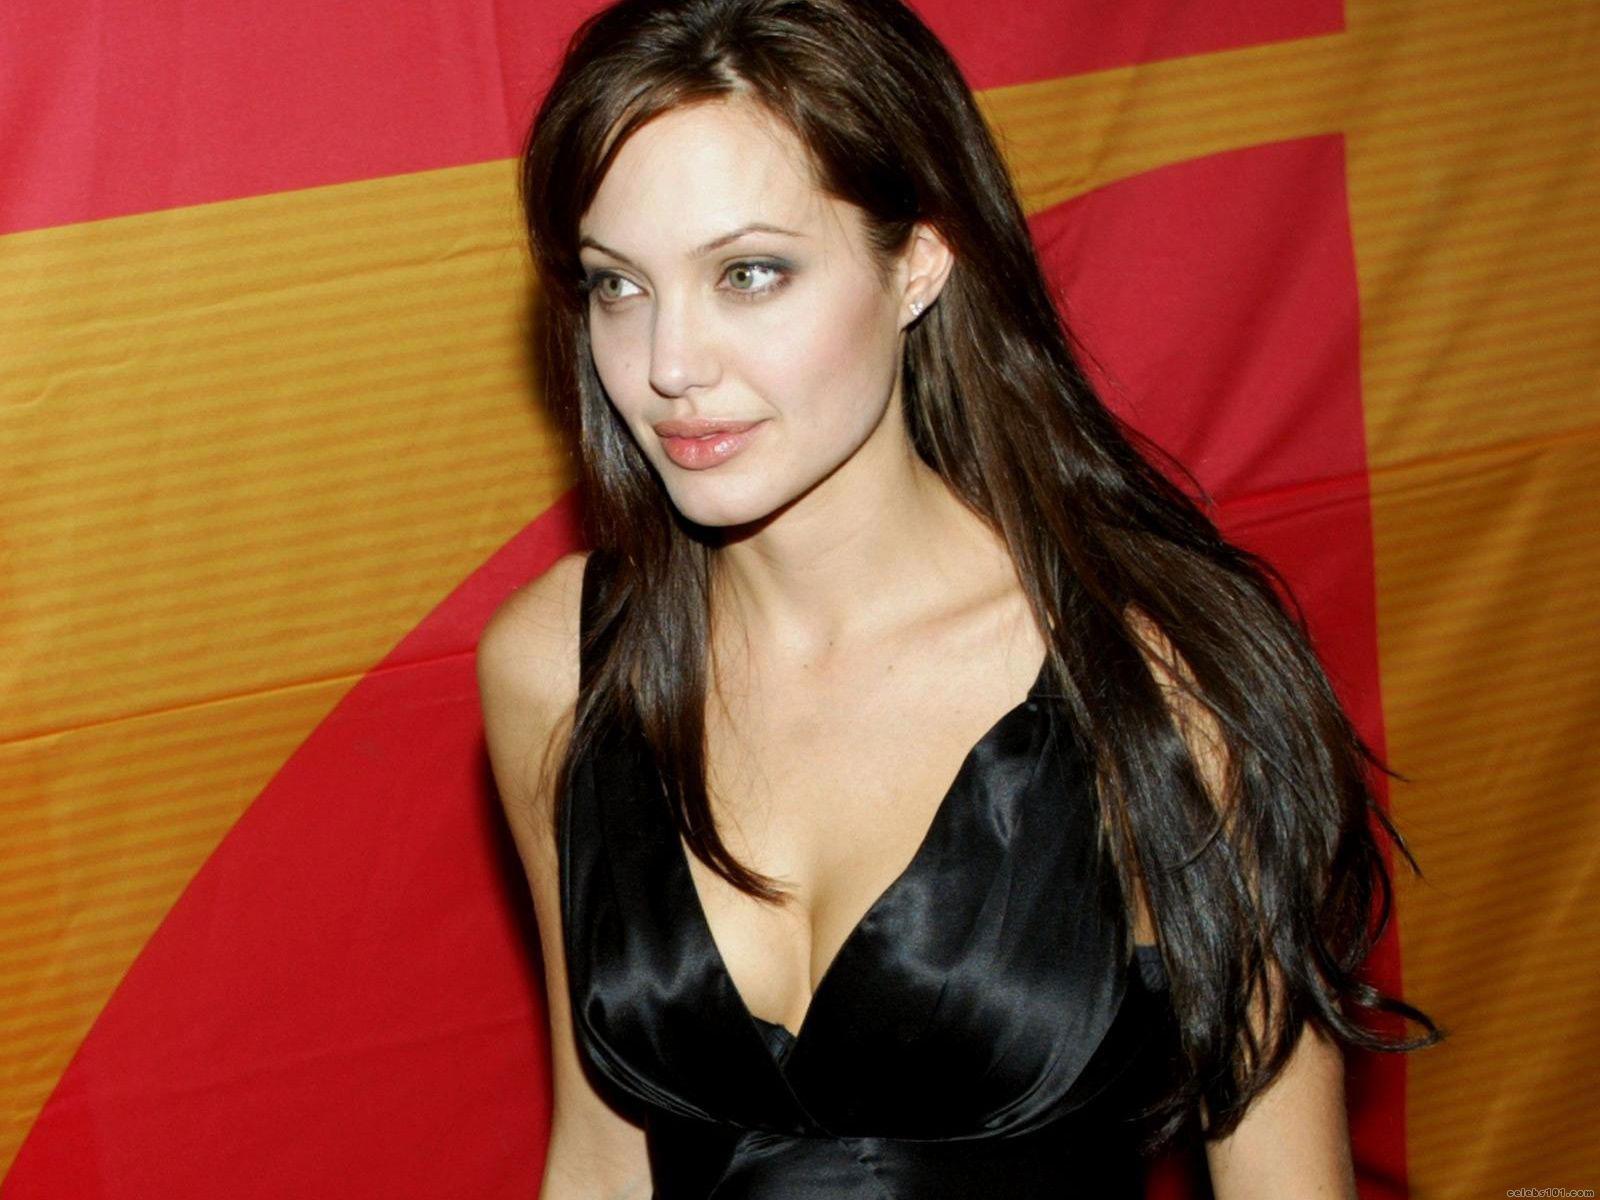 http://3.bp.blogspot.com/_UtNW1JfsC-M/TA6Y_OFWhgI/AAAAAAAAAxM/EkB65lrgvKE/s1600/Angelina_Jolie+Hot+Girls+Inn.jpg.jpg